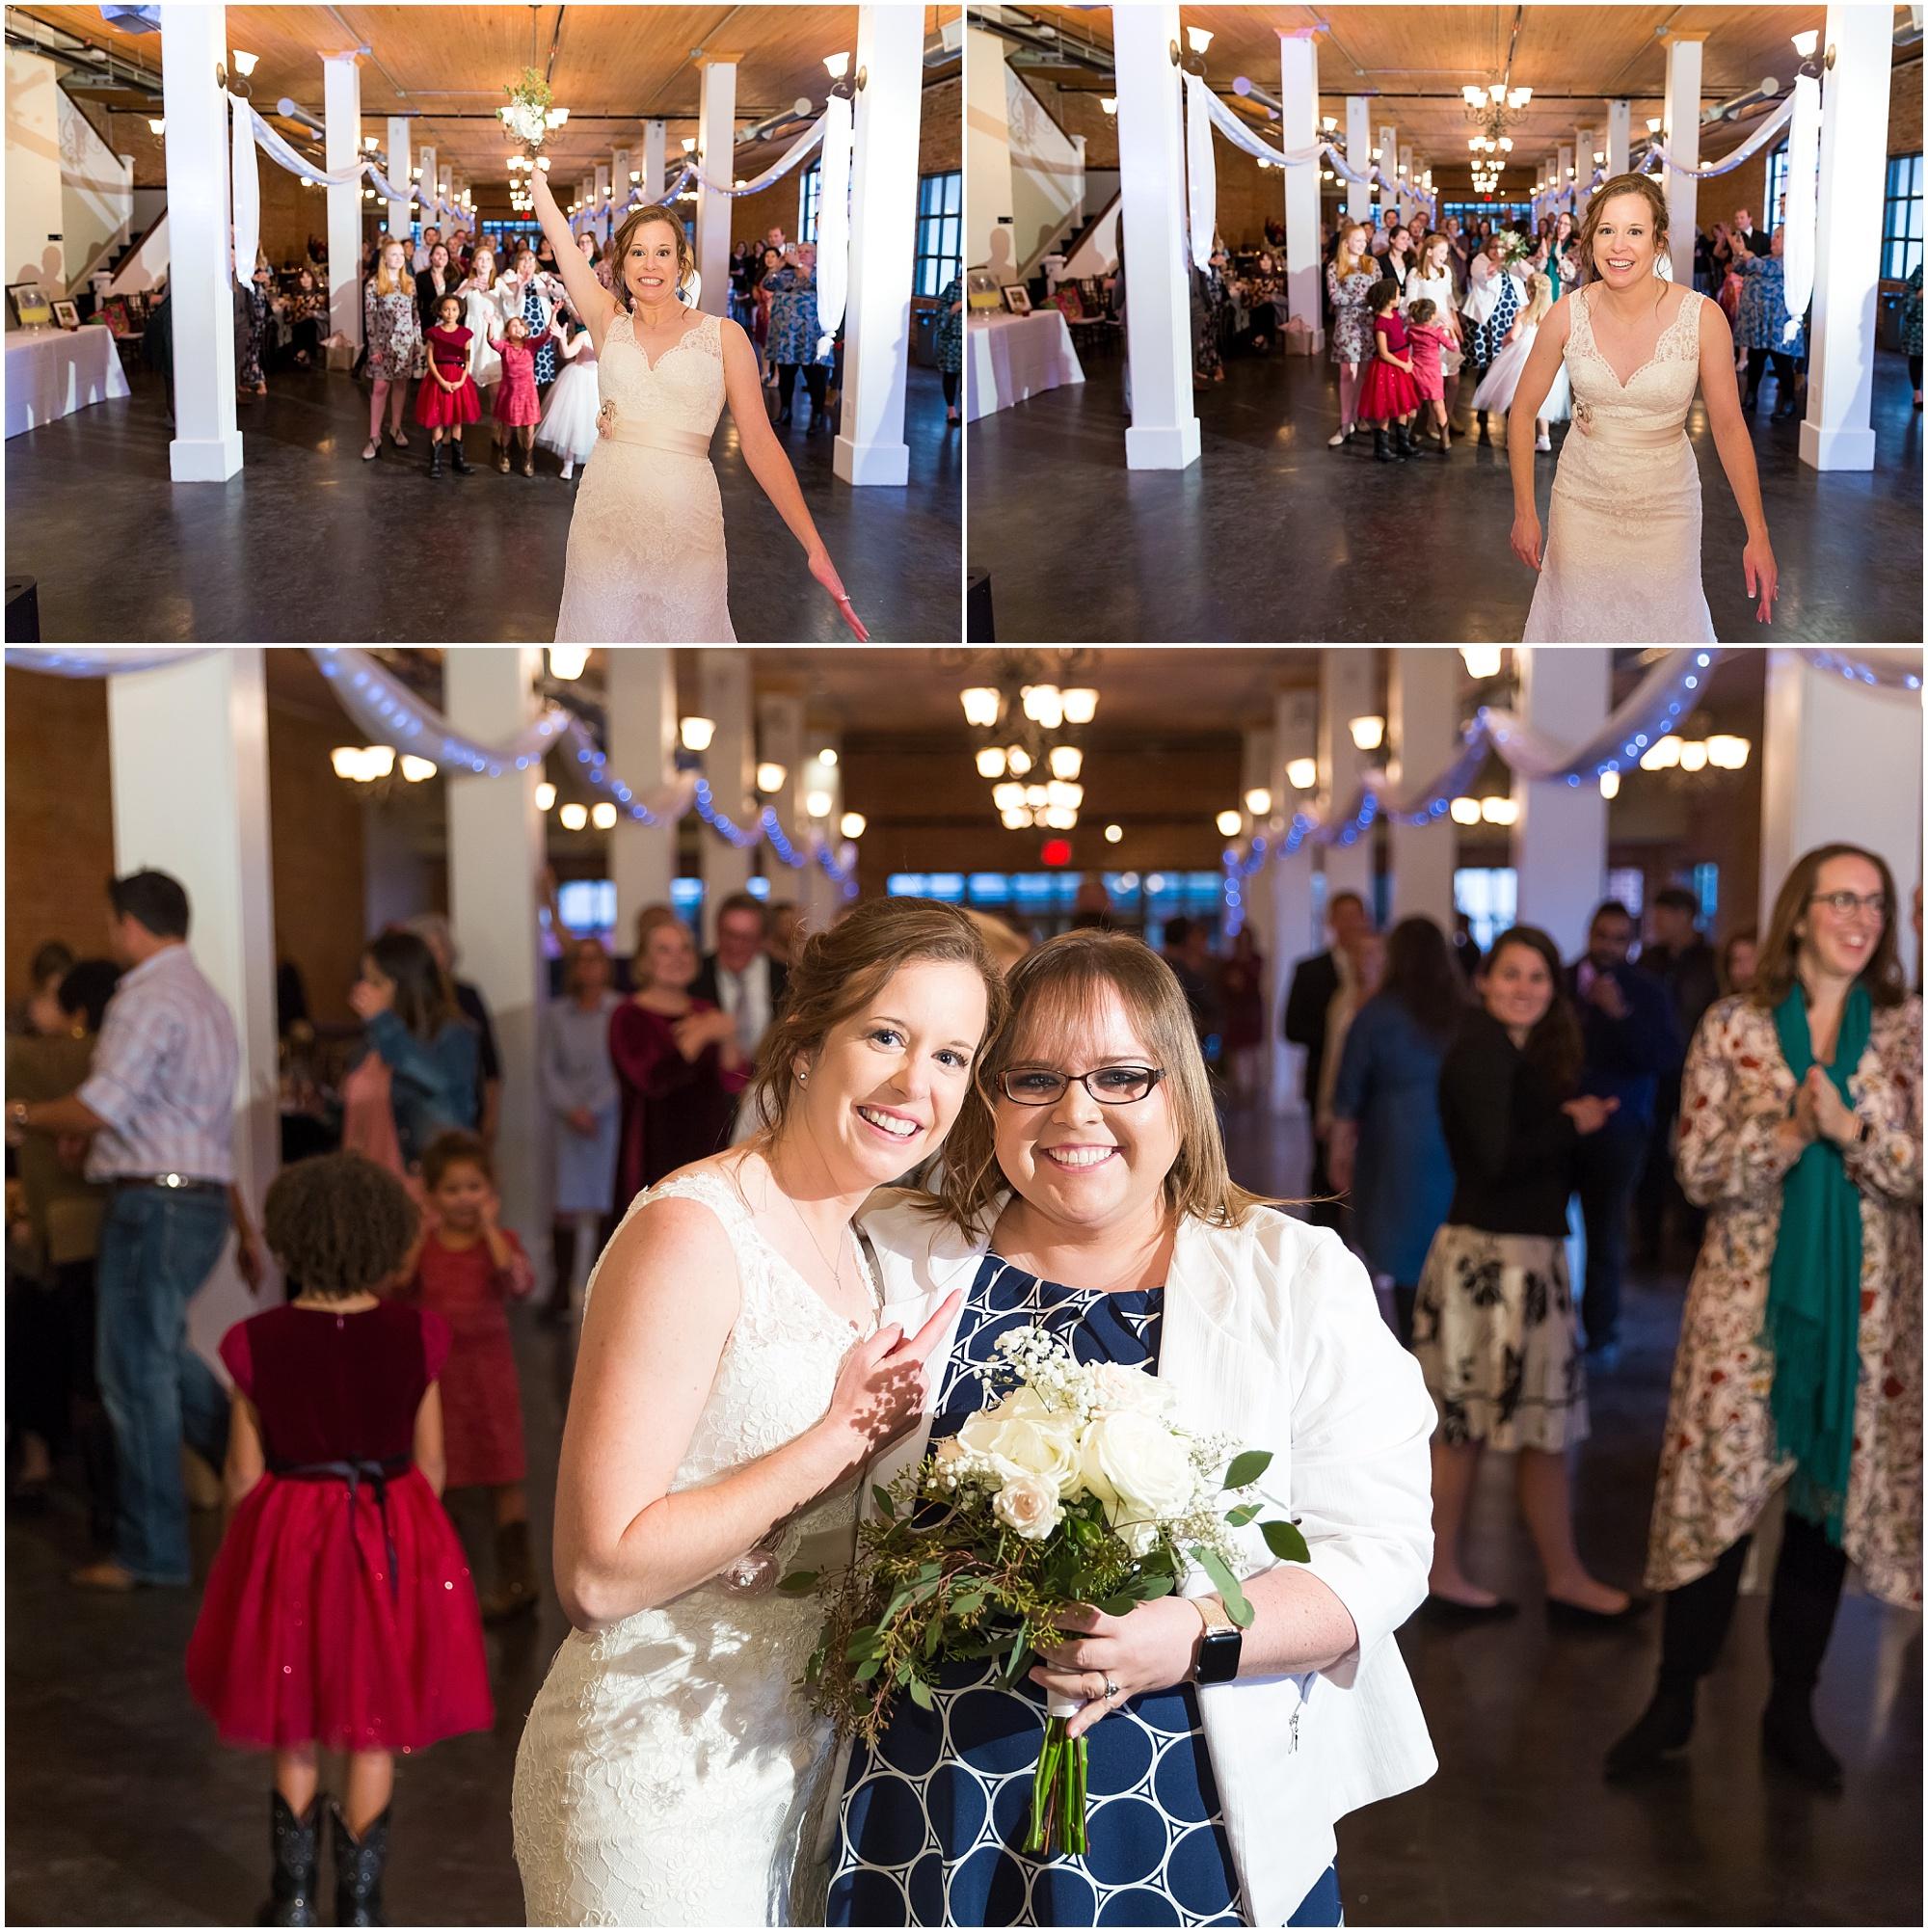 Downtown-Waco-Fall-Wedding_0040.jpg